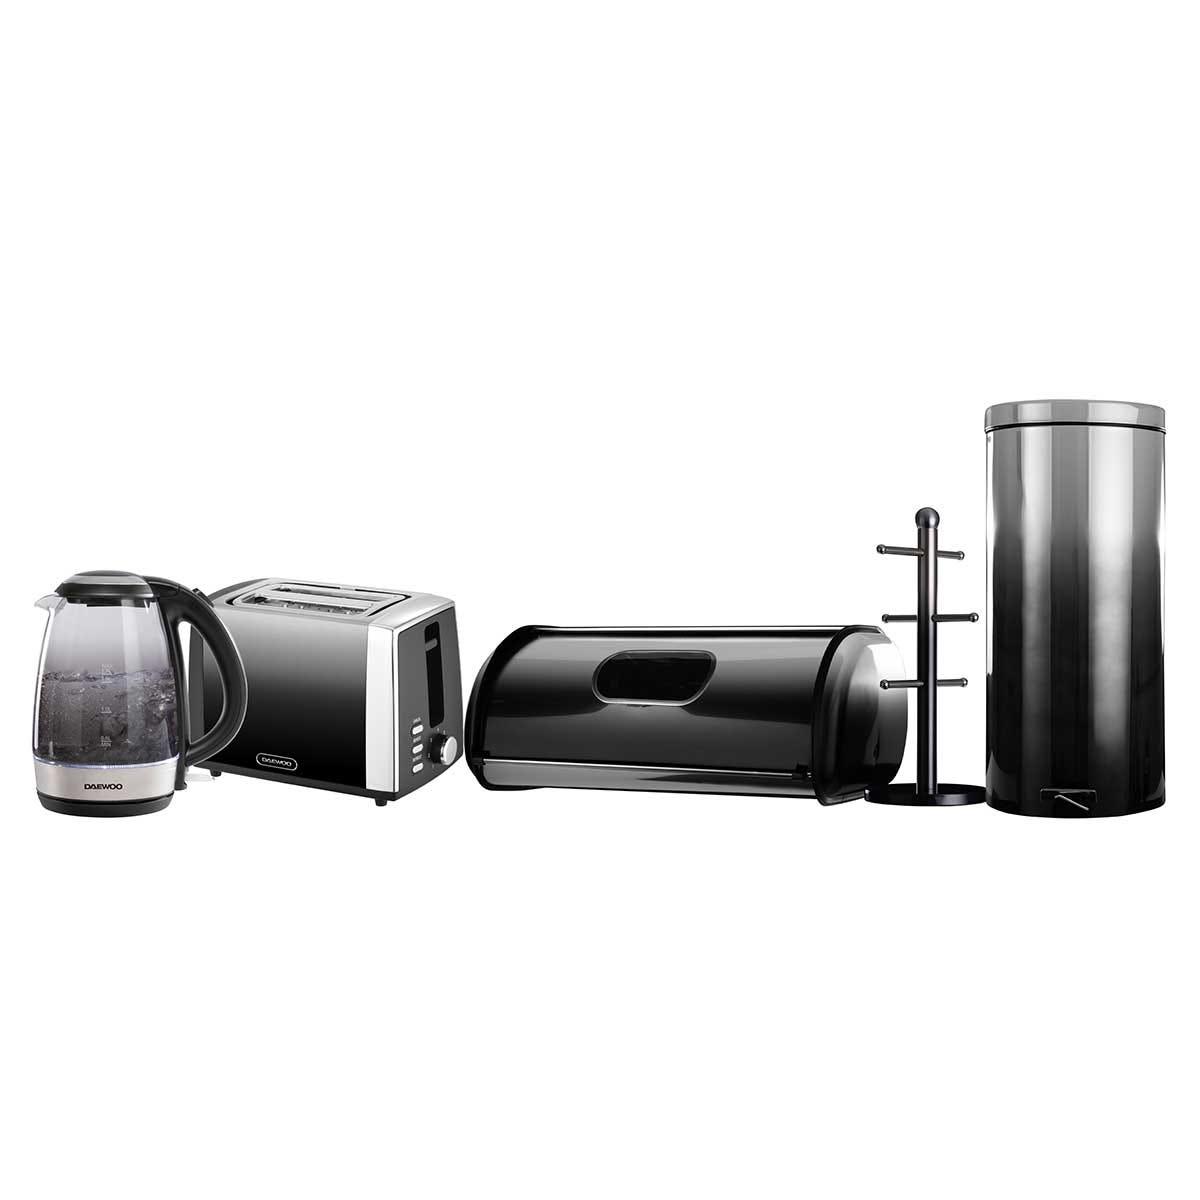 Daewoo SDA2396DS Callisto 1.7L 2200W Glass Kettle, 2 Slice Toaster, Bread Bin, Mug Tree and 20L Pedal Bin Set - Black